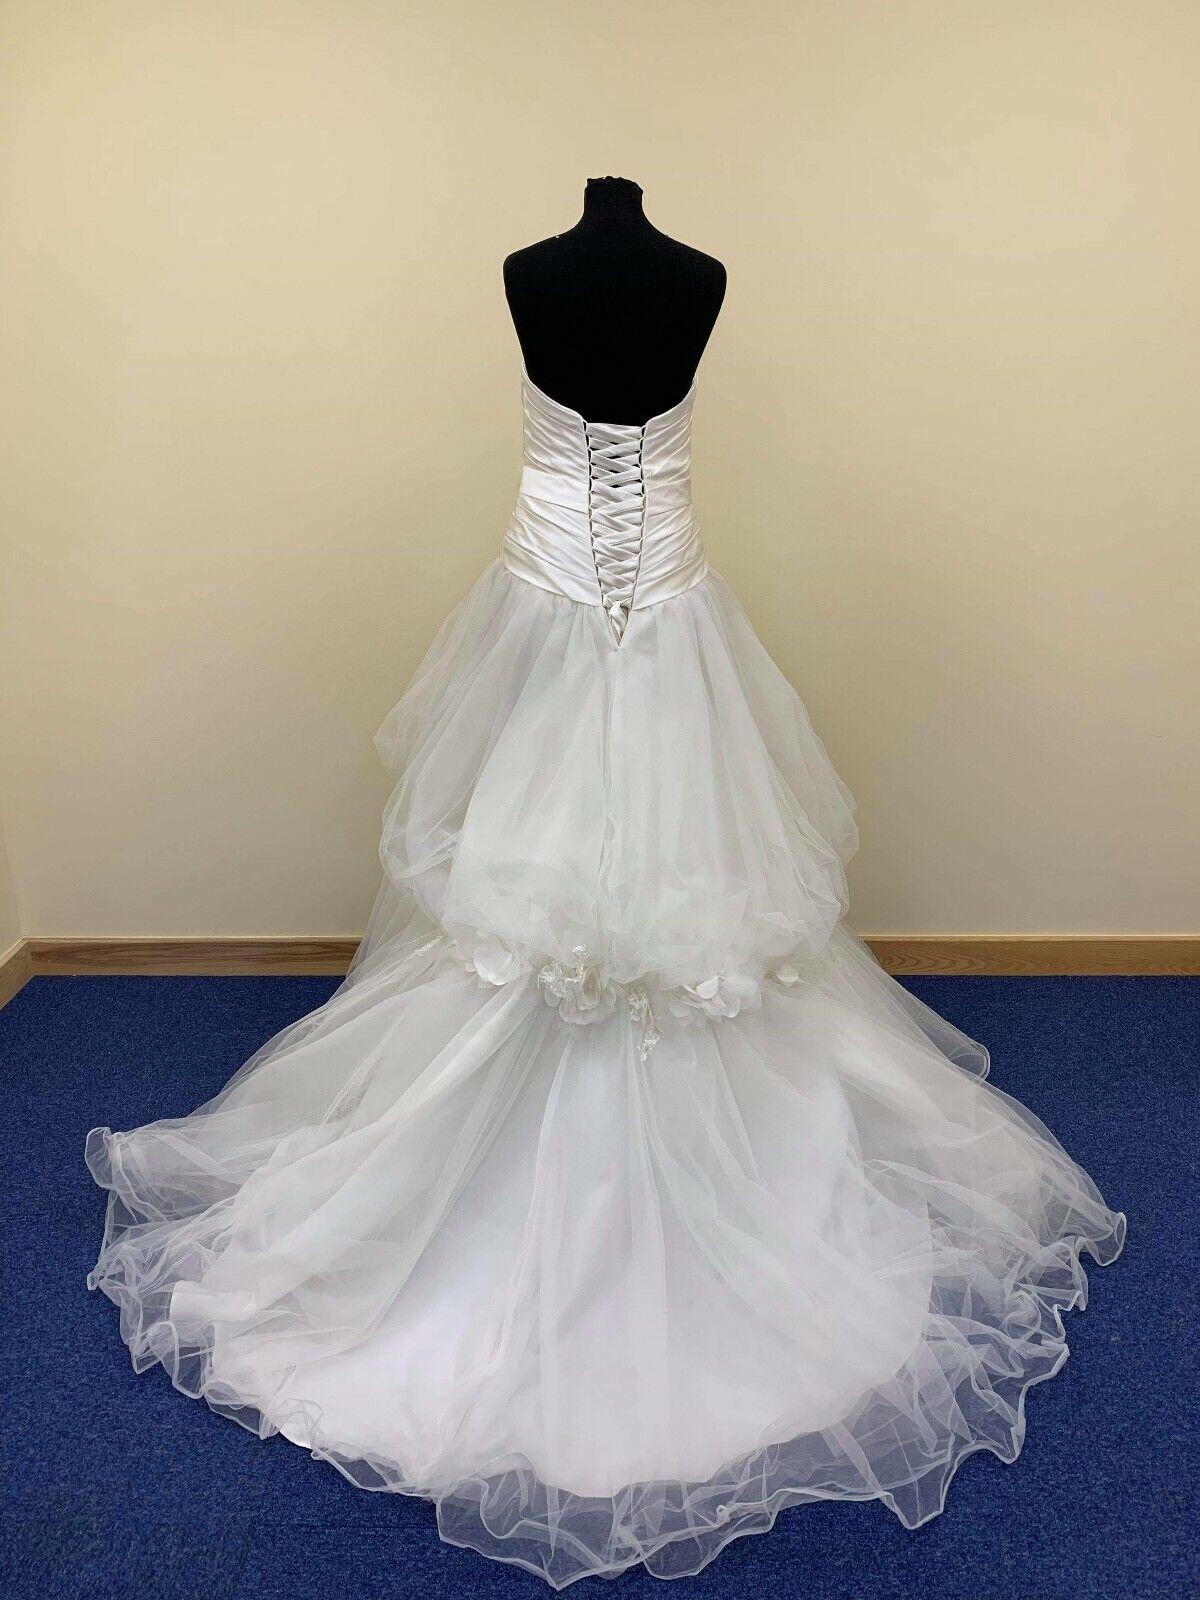 Wholesale 5 Disney Fairytale Weddings Gowns, flowergirls, Cinderella Ariel